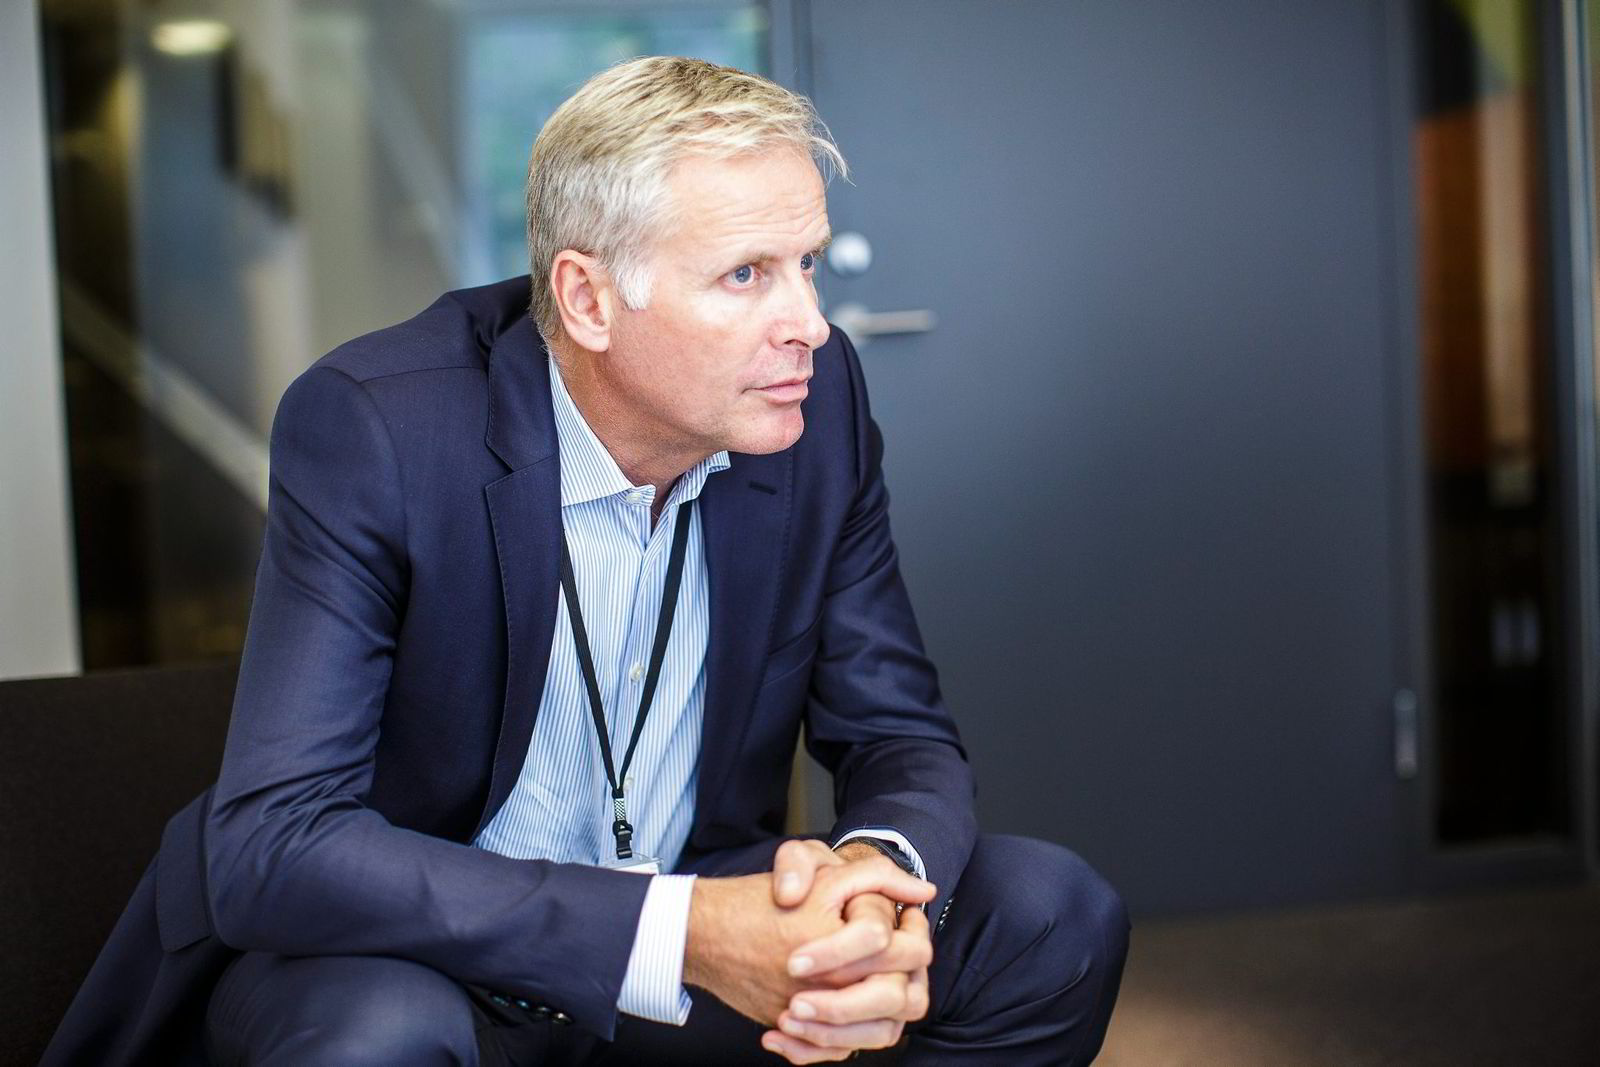 Administrerende direktør i First House, Per Høiby.